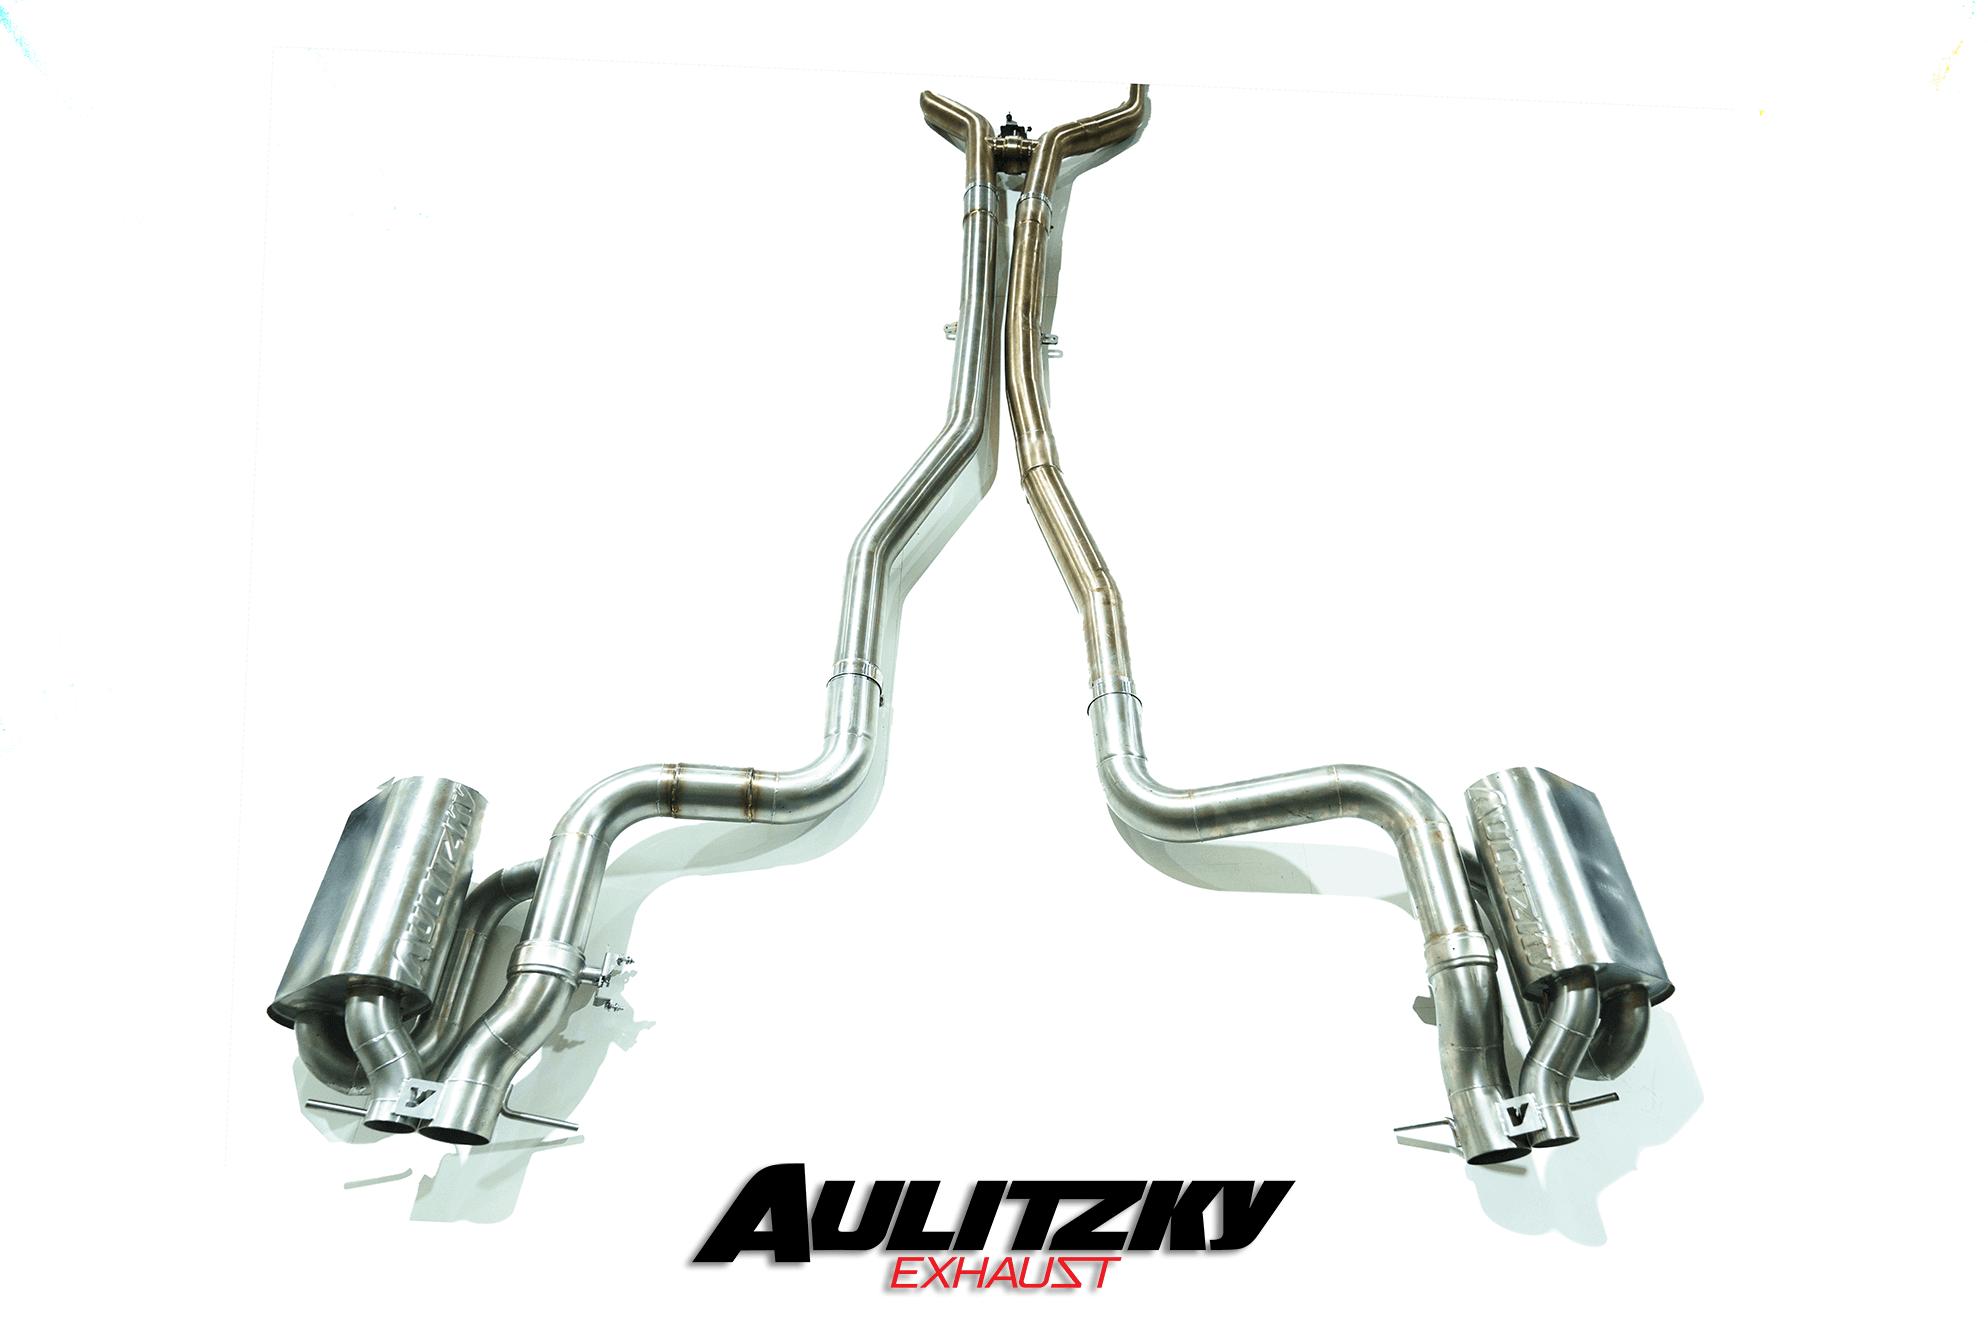 Aulitzky Exhaust | Mercedes-AMG C-Klasse | C63 AMG | W205/C205 | Edelstahl Abgasanlage ab Kat mit Klappensteuerung